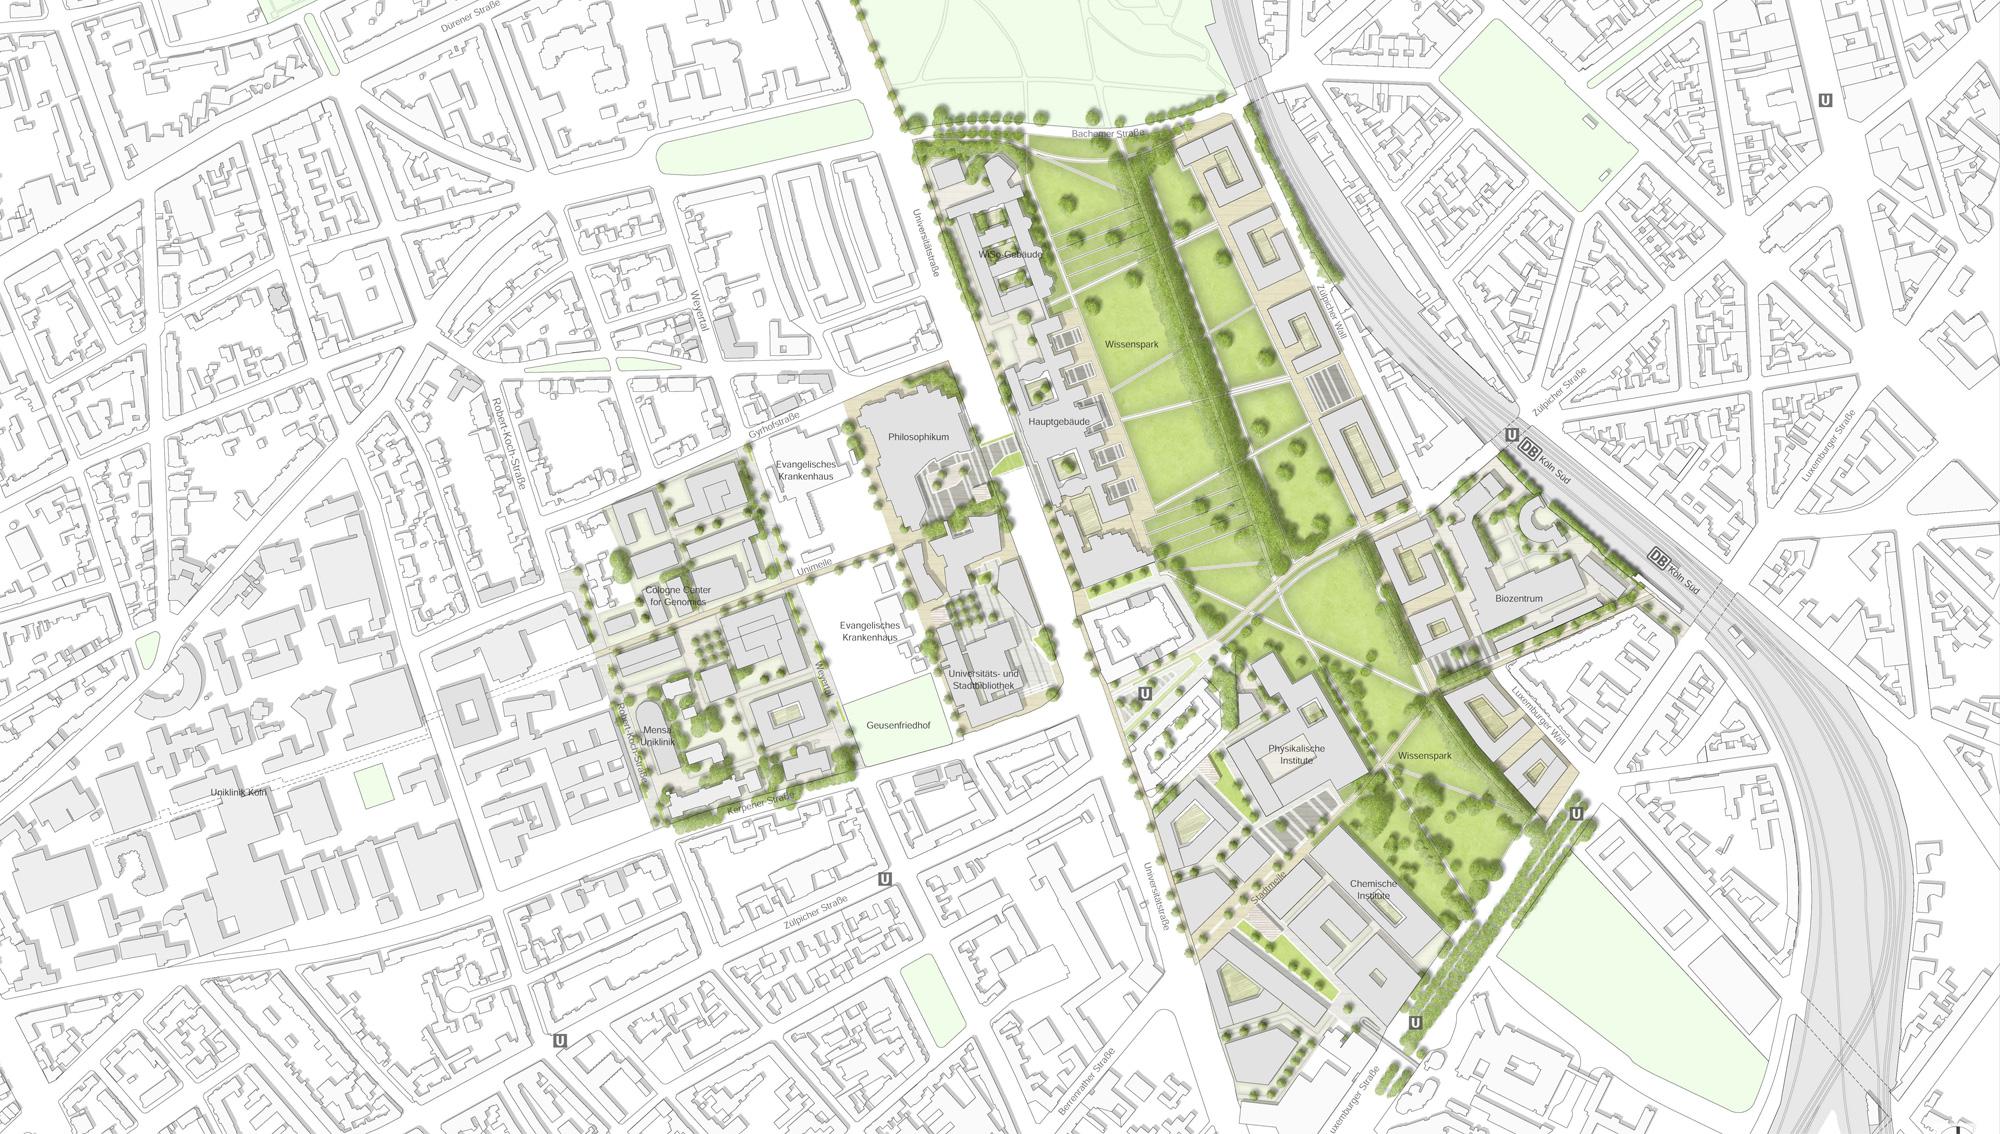 Landschaftsarchitekten Köln rmp stephan lenzen landschaftsarchitekten frameworks and concepts